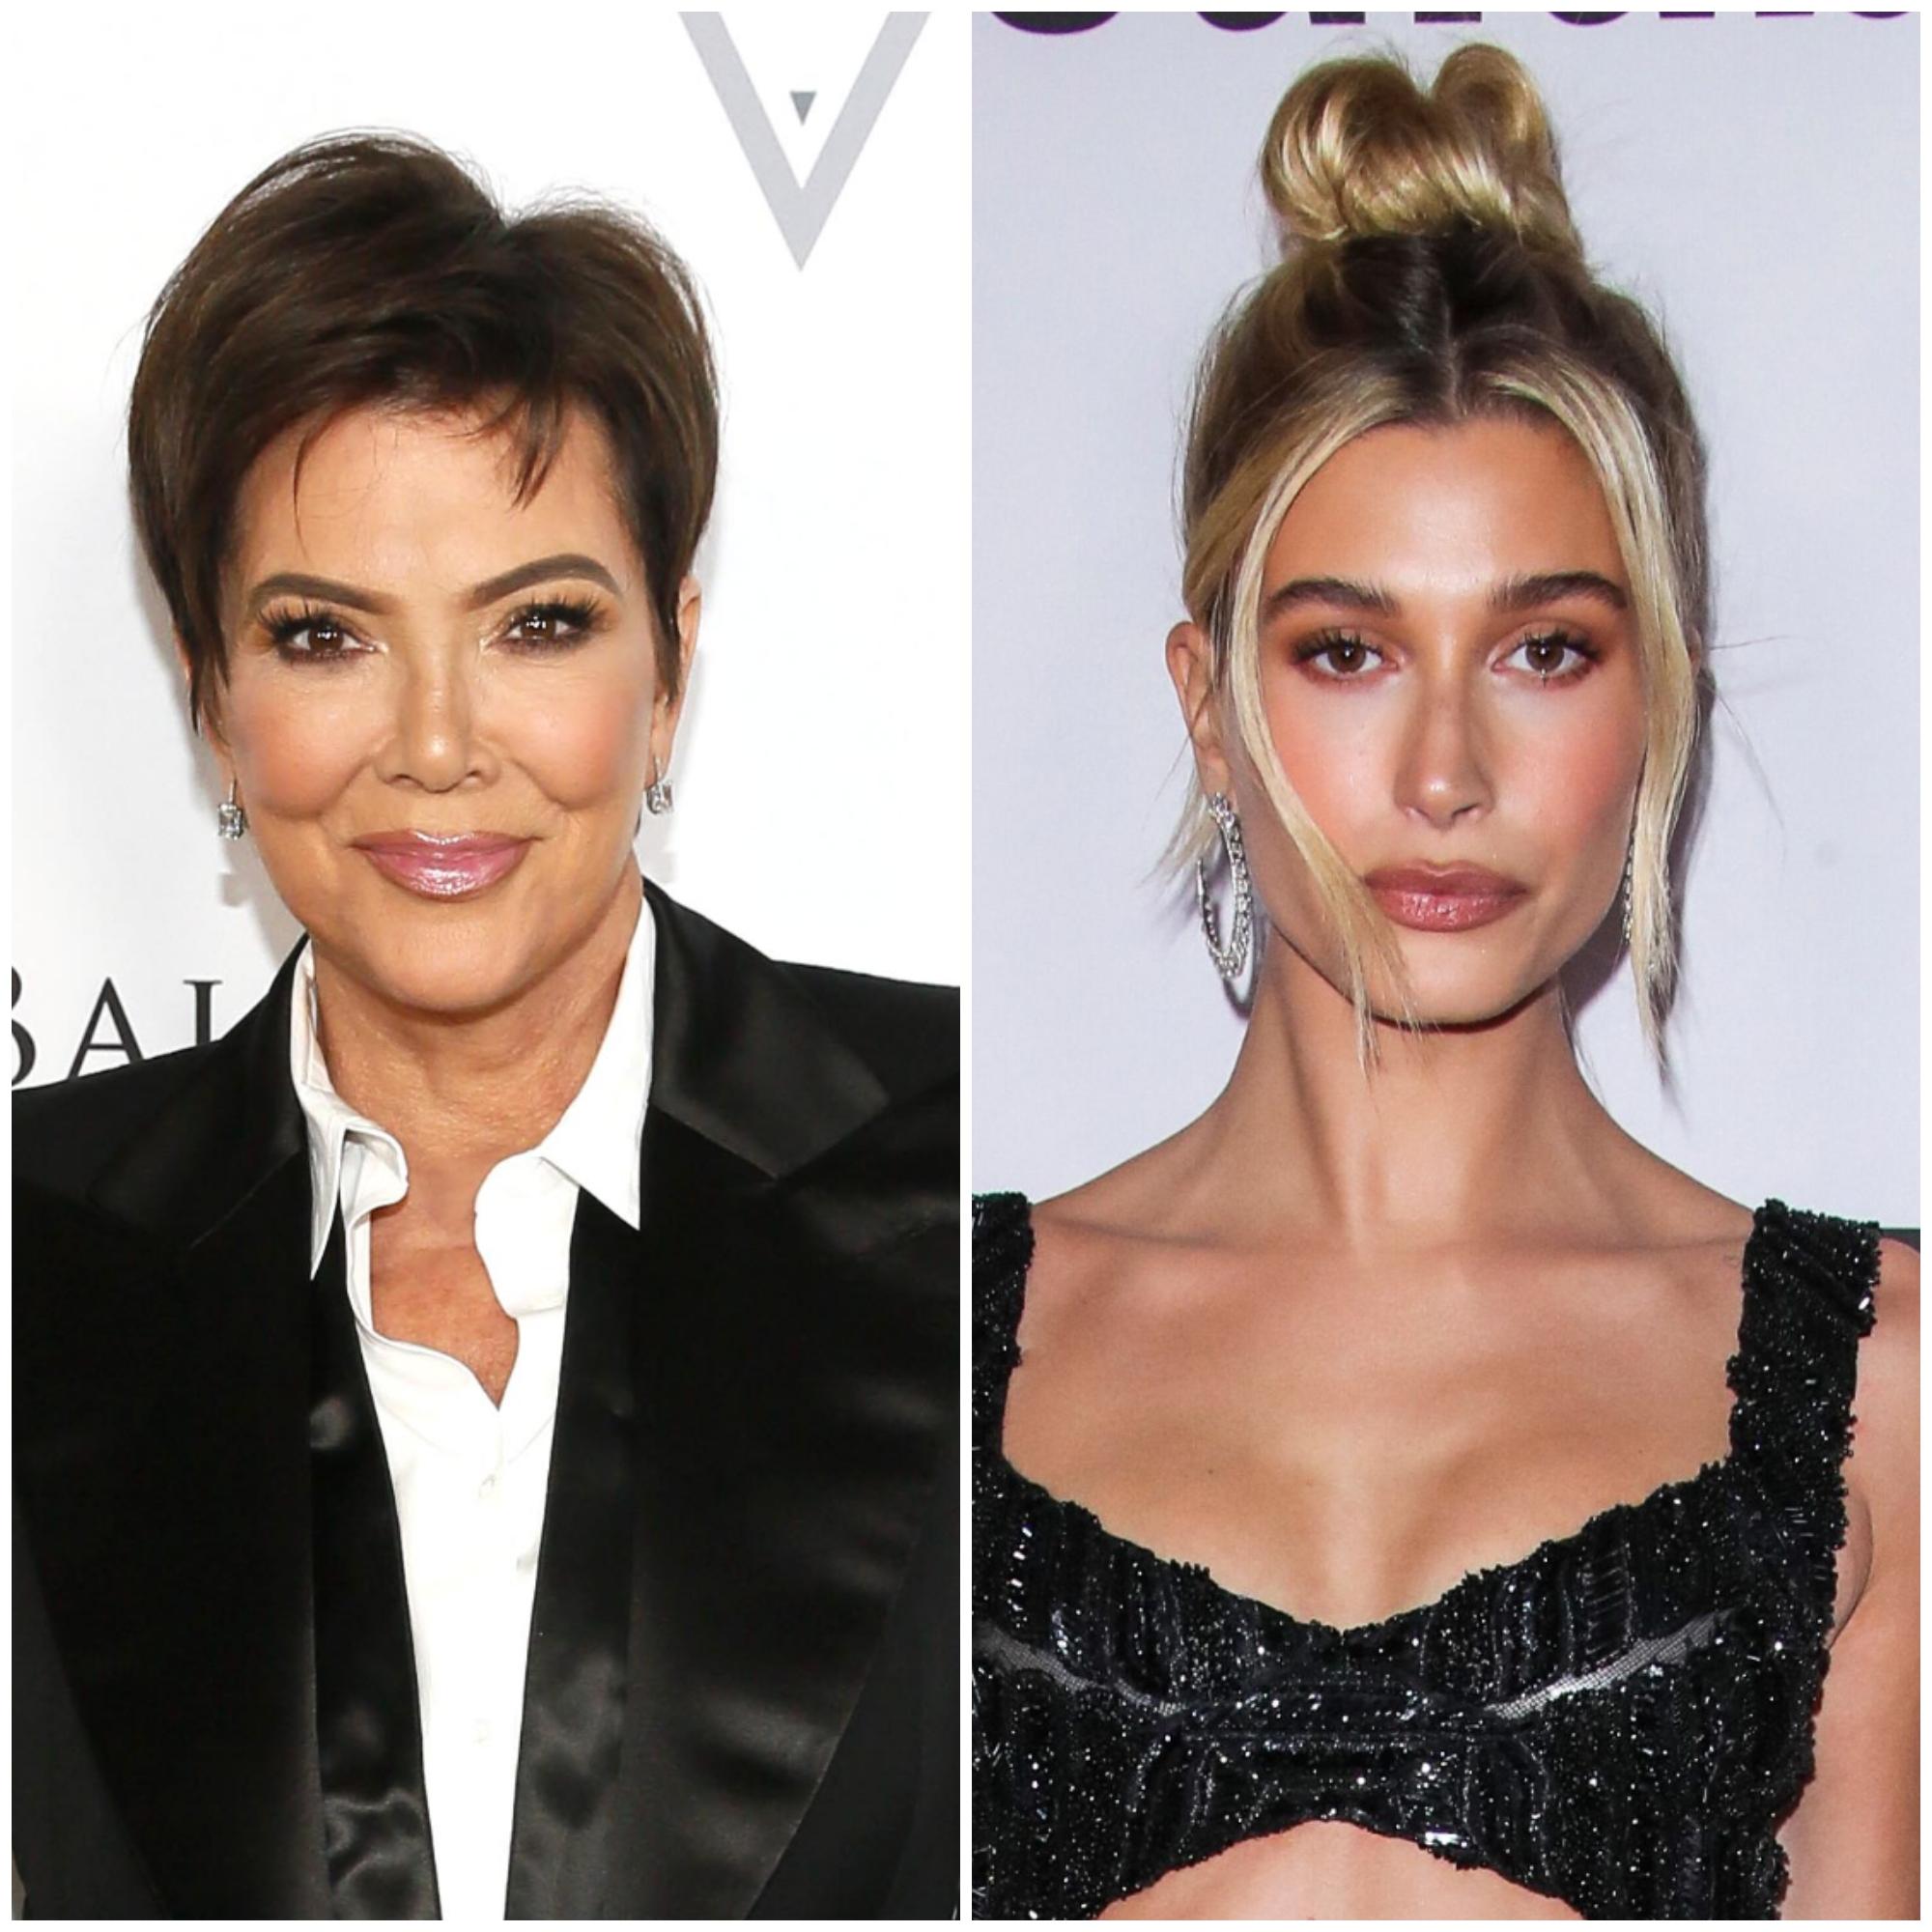 Kris Jenner Supports Hailey Baldwin Amid Backlash From Selena Fans